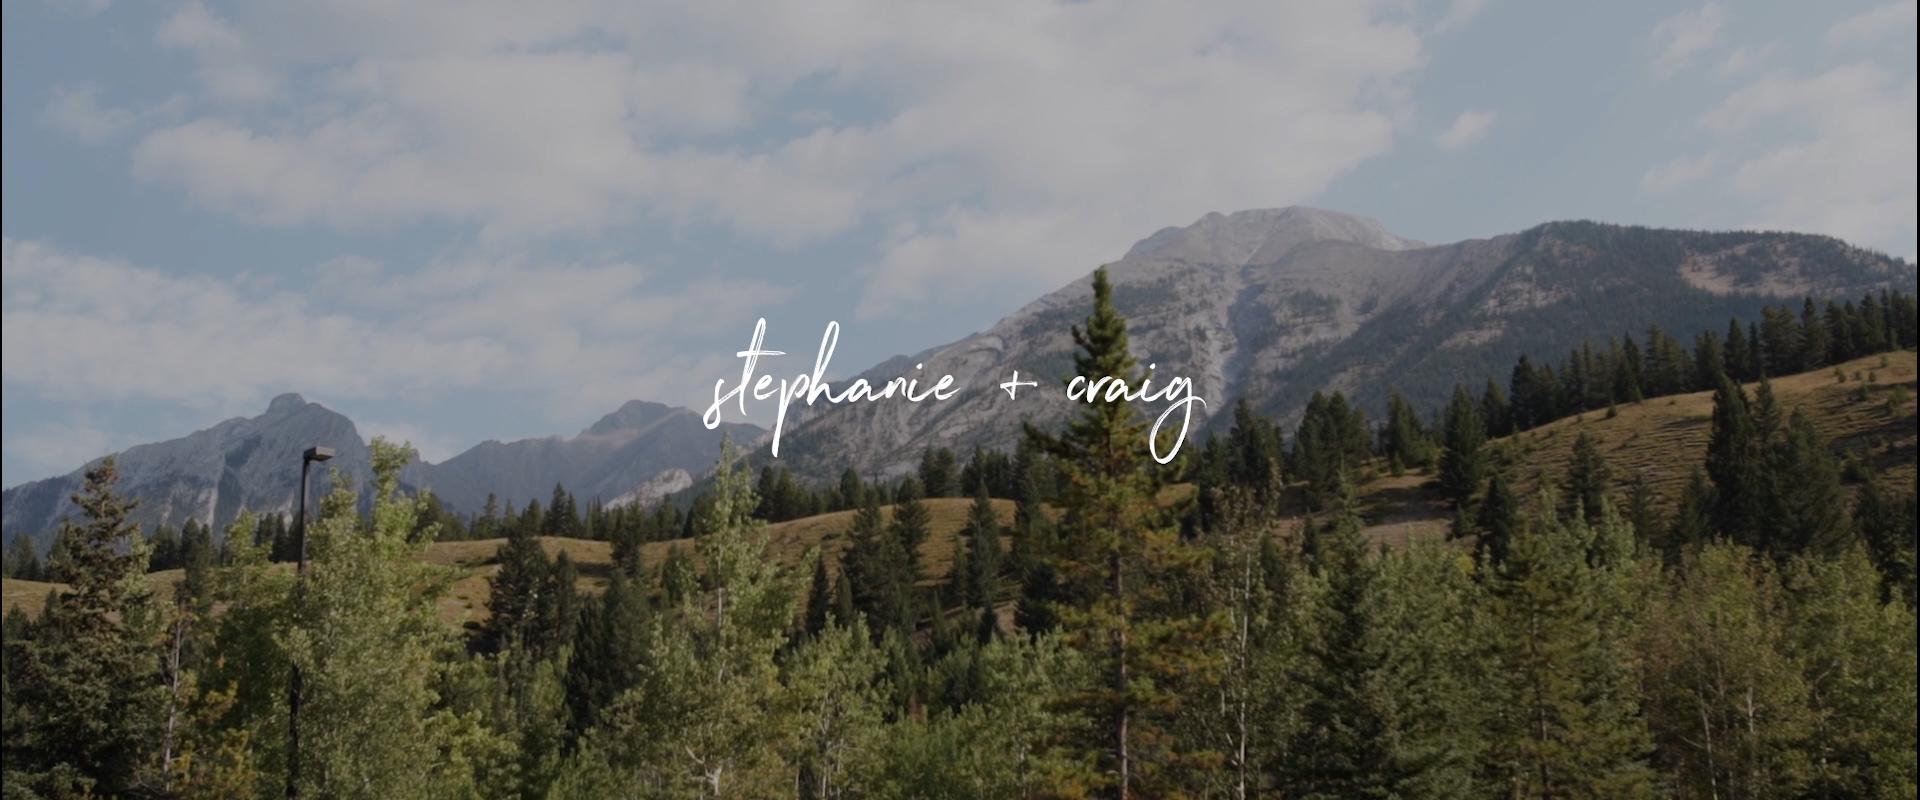 Stephanie + Craig | Canmore, Canada | silvertip resort